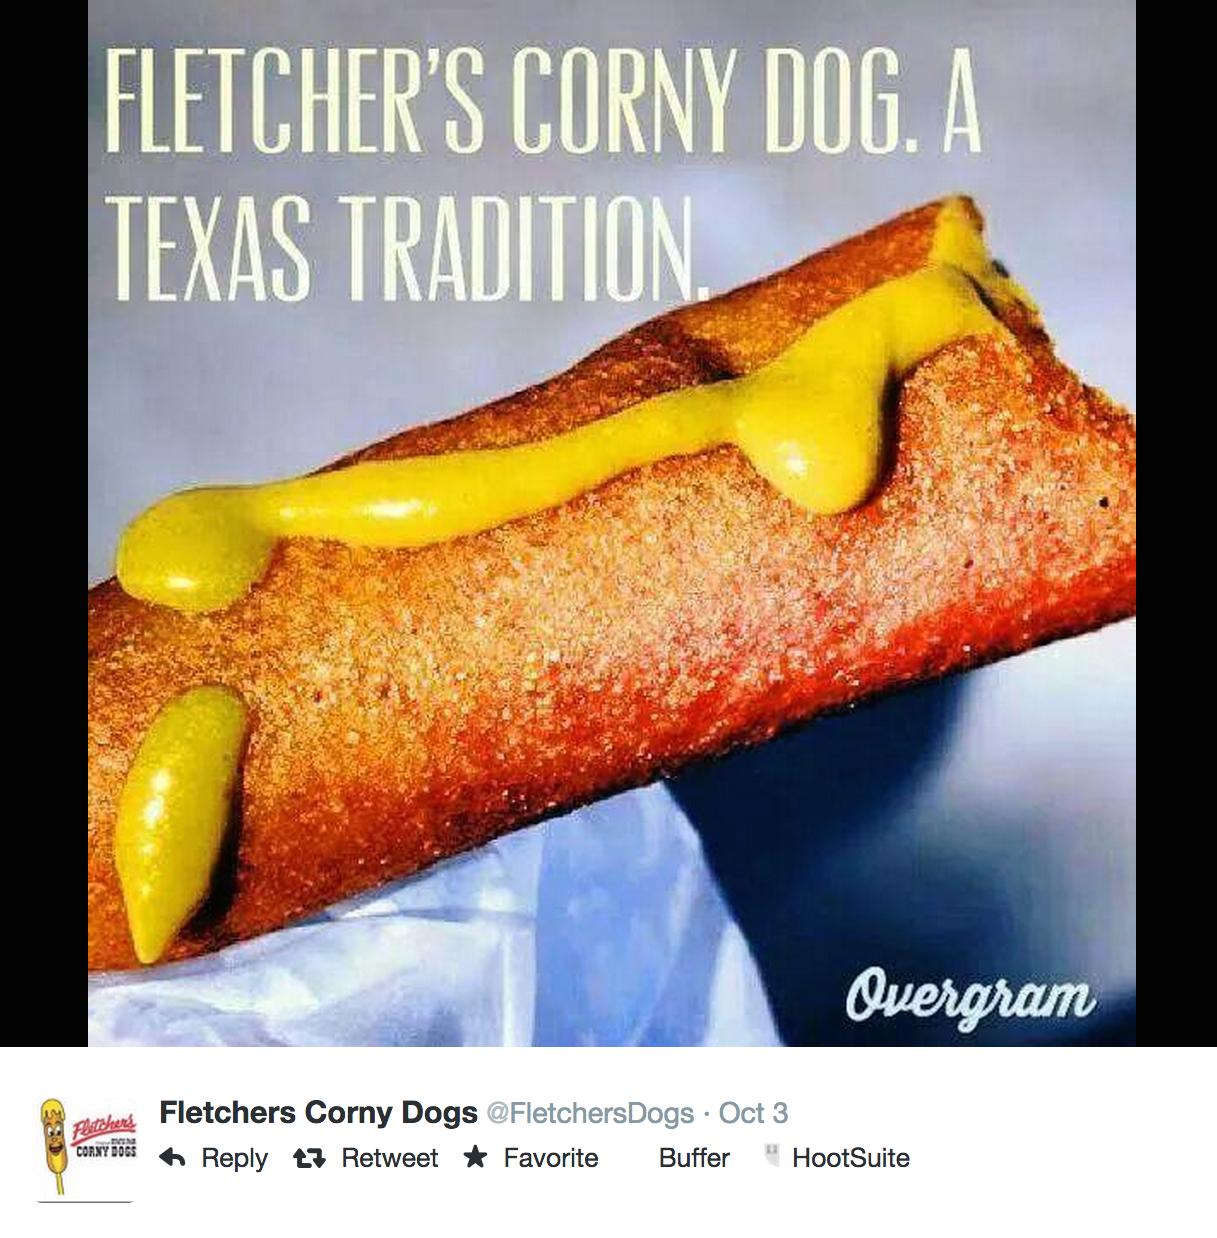 Fletchers Corny Dog, 2014 State Fair of Texas